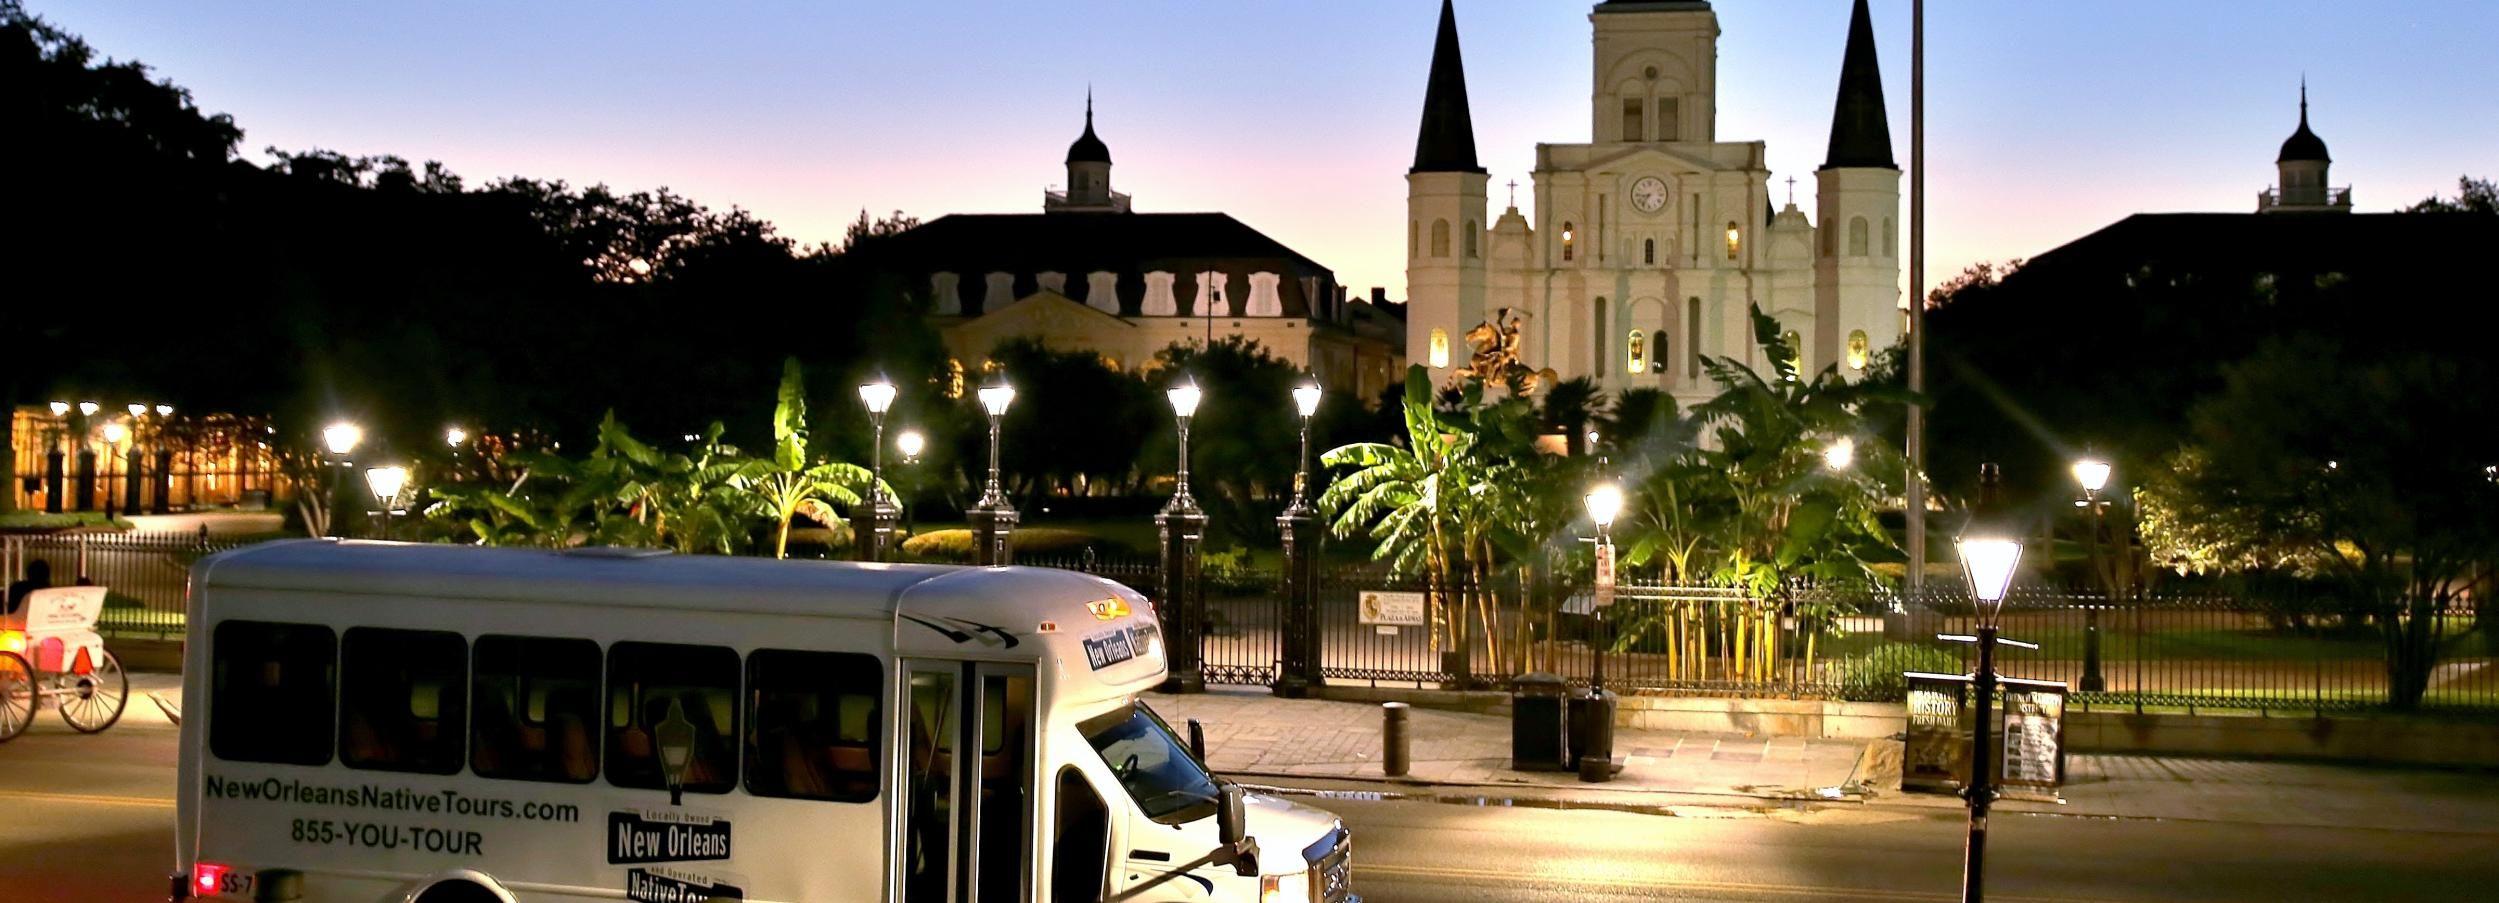 Nueva Orleans: tour en autobús Dead of Night Ghosts and Haunts